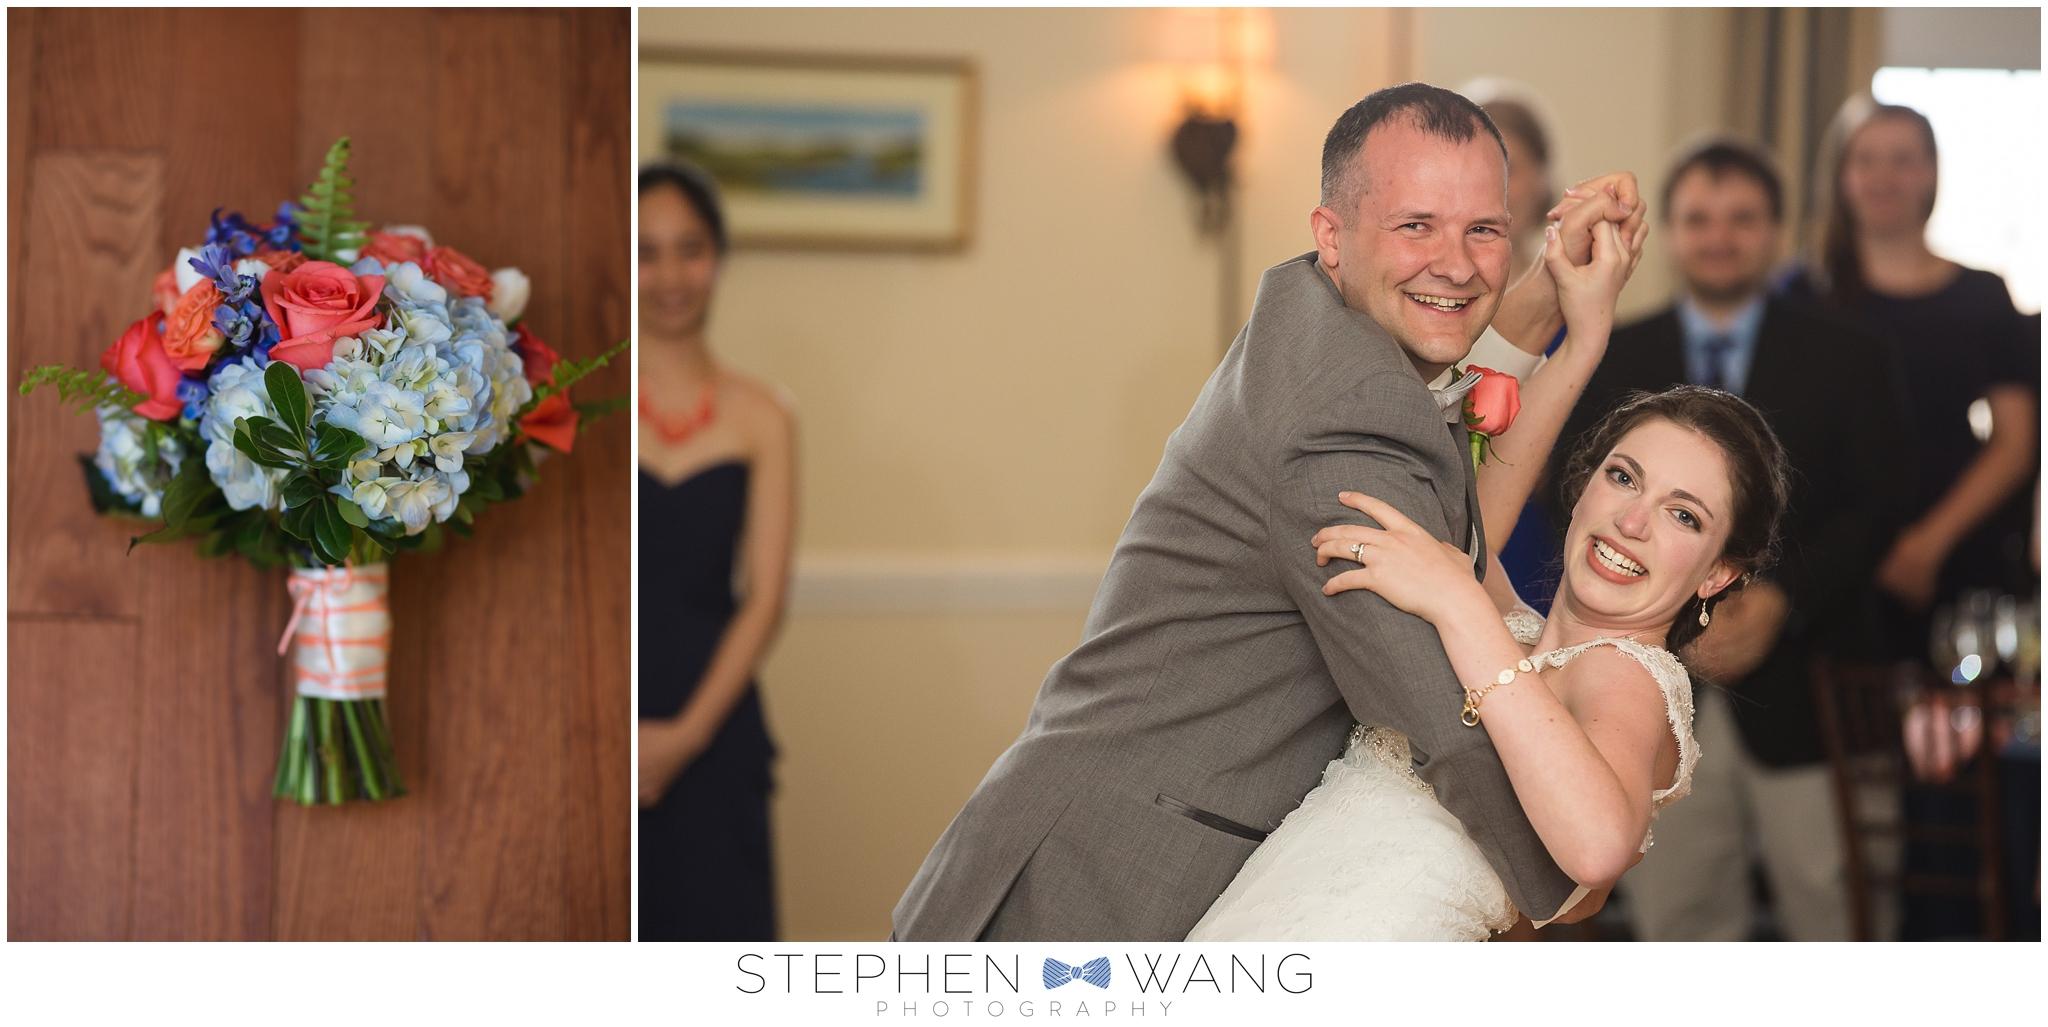 Stephen Wang Photography Wedding Photographer Connecticut CT-12-24_0007.jpg